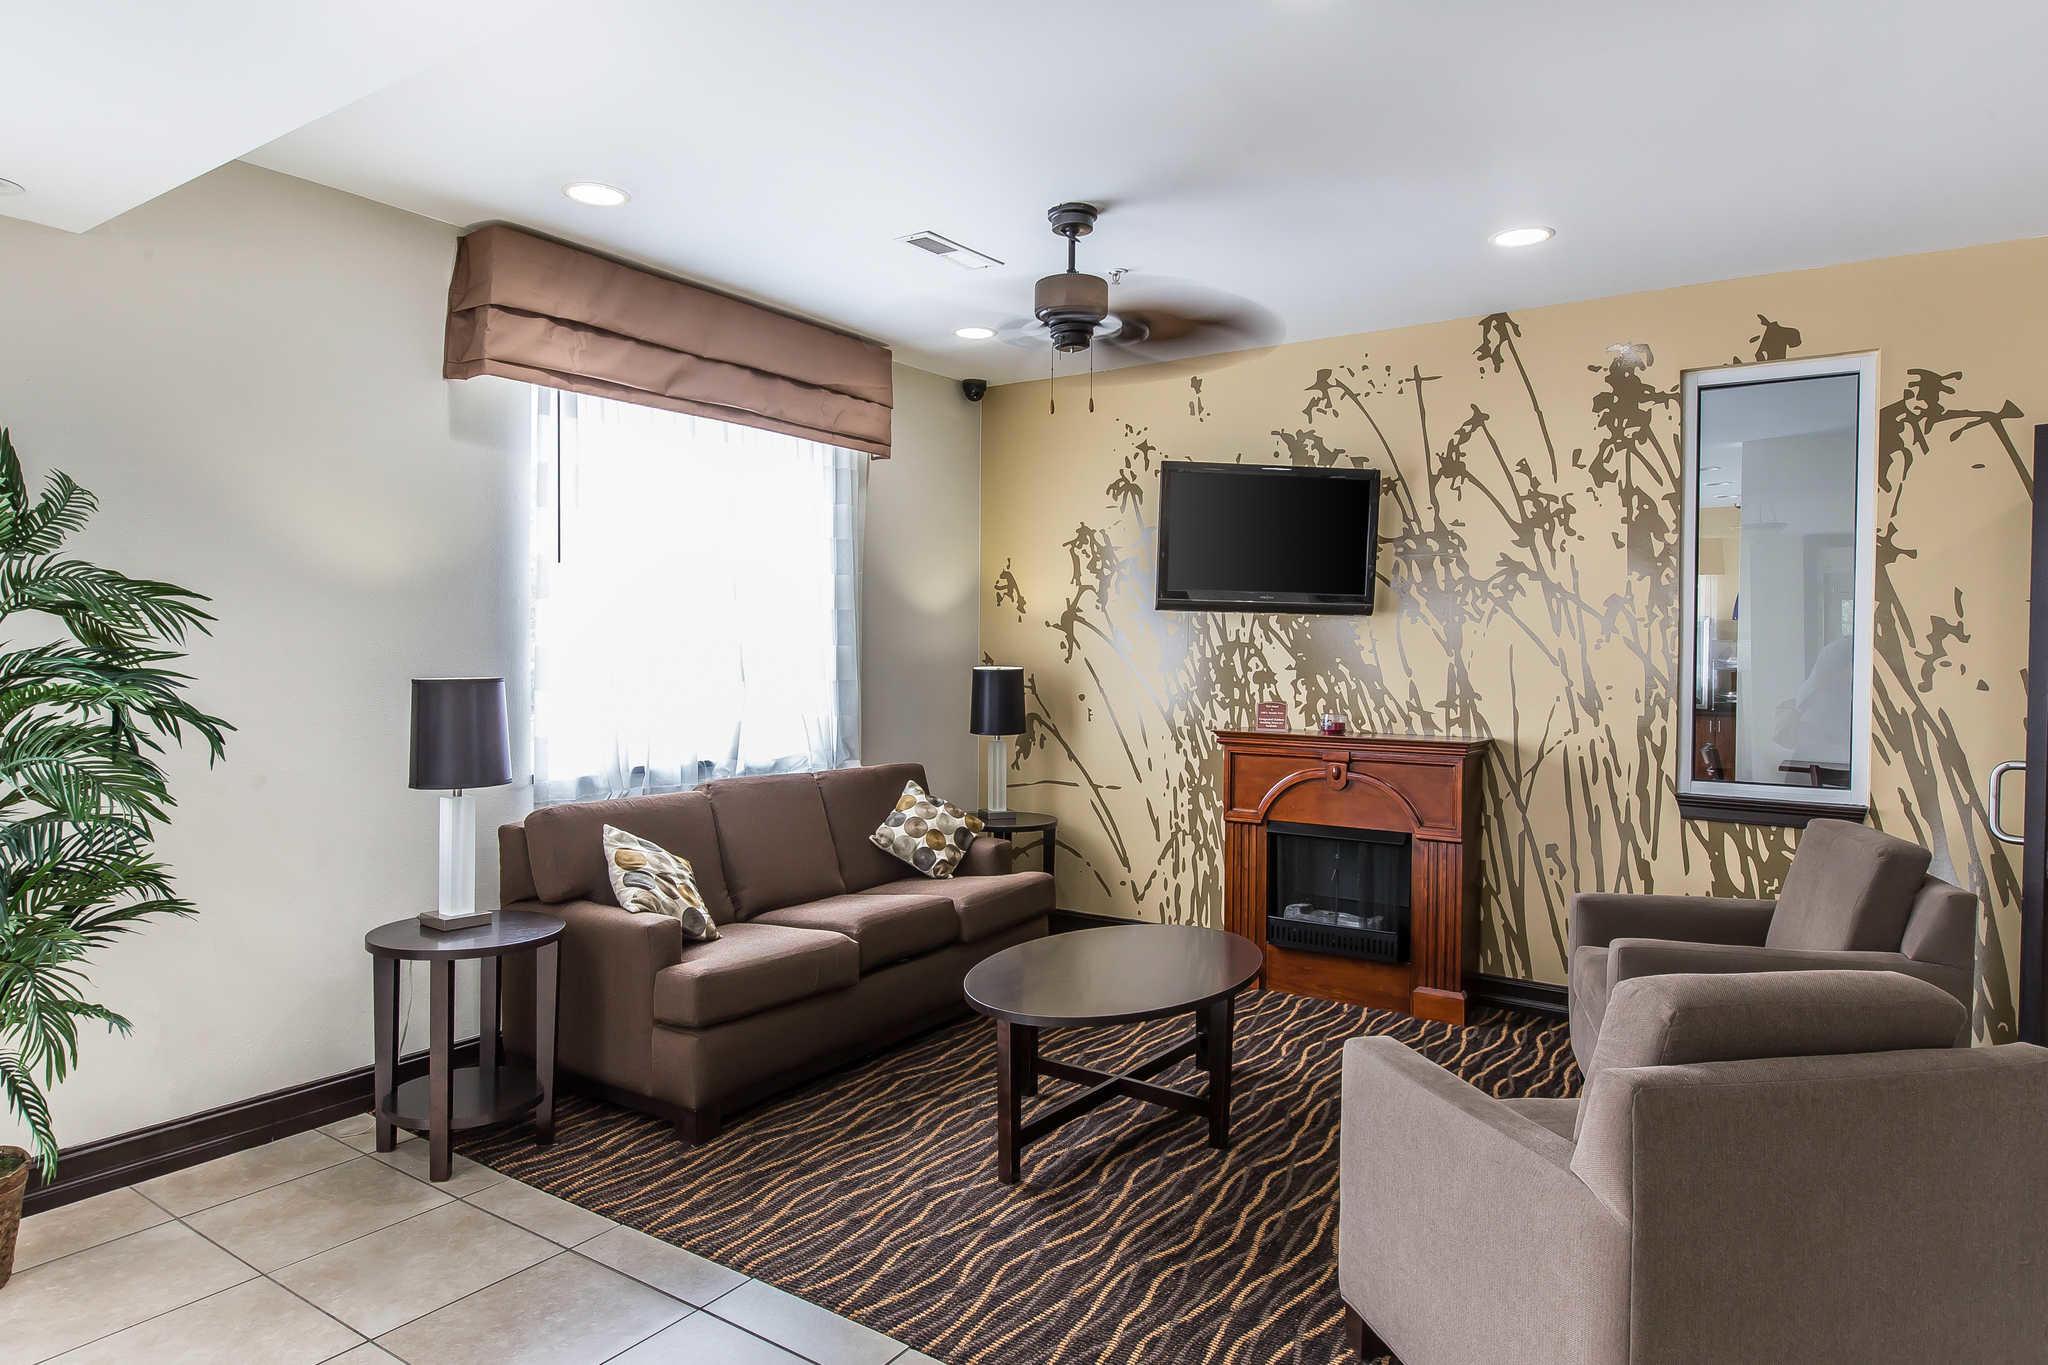 Sleep Inn & Suites At Kennesaw State University image 4